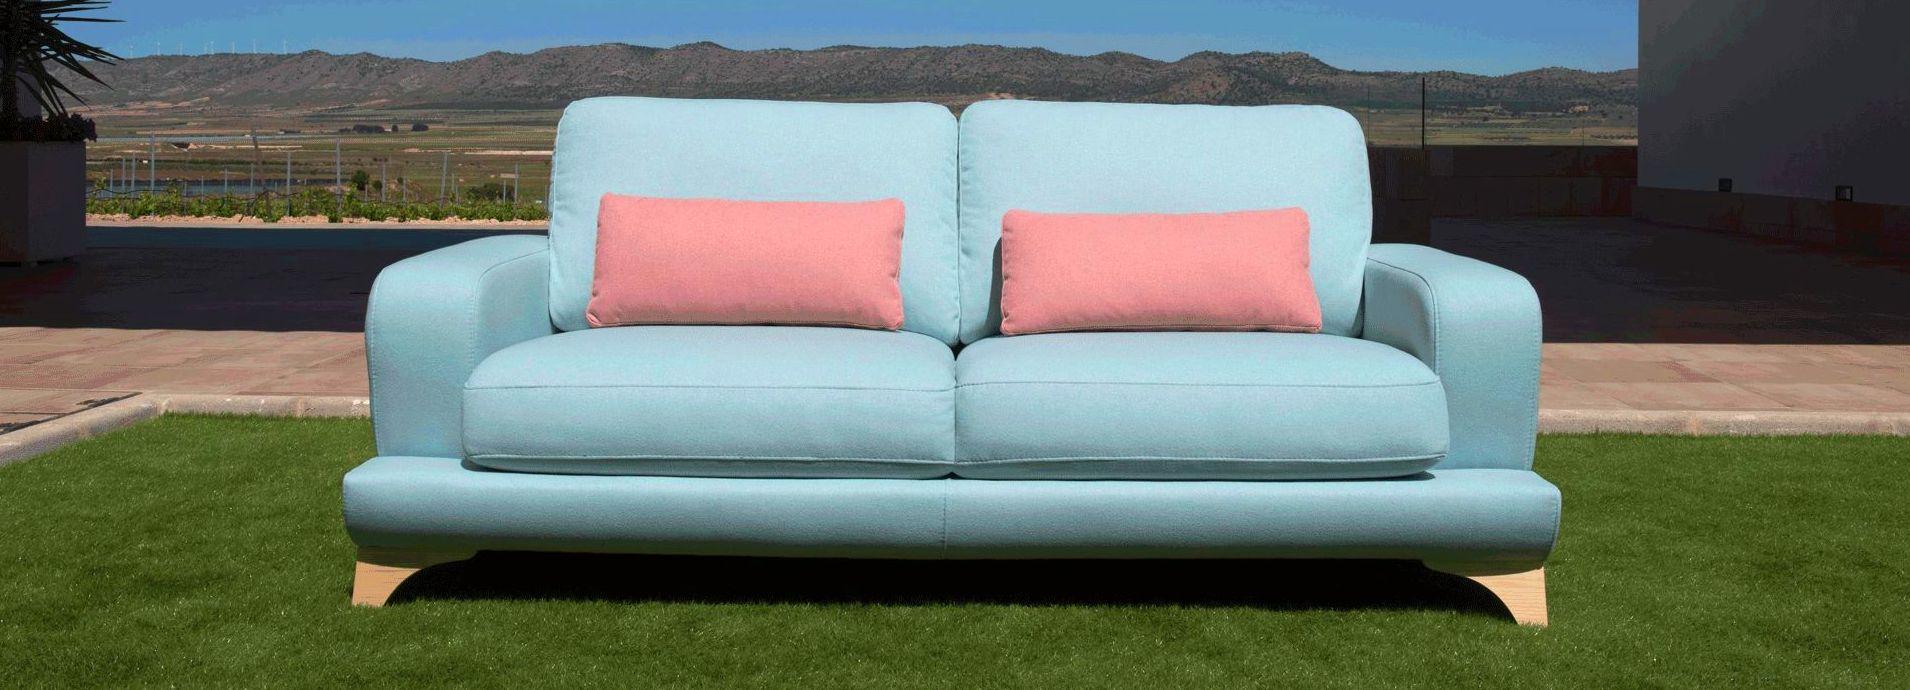 Foto 8 de Tienda de colchones y sofás en Pollença | Relaxing